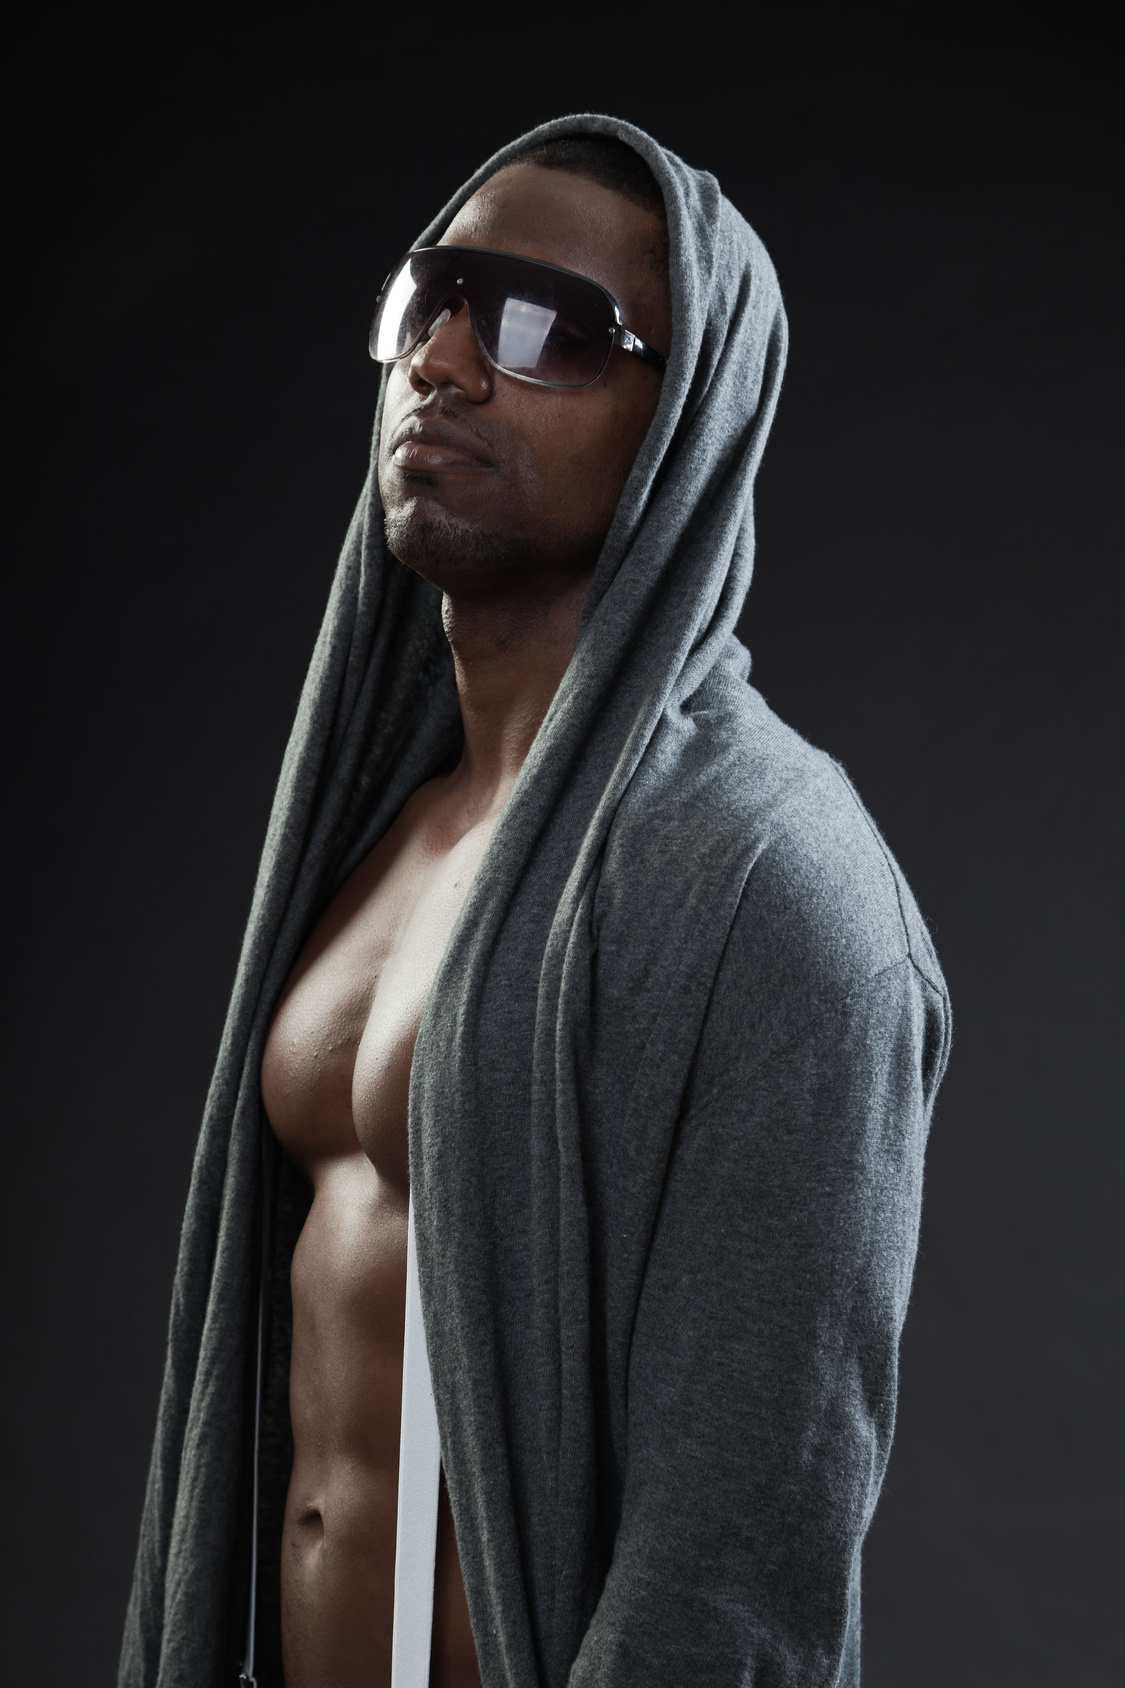 Black fitness man urban style with dark sunglasses. Studio shot.